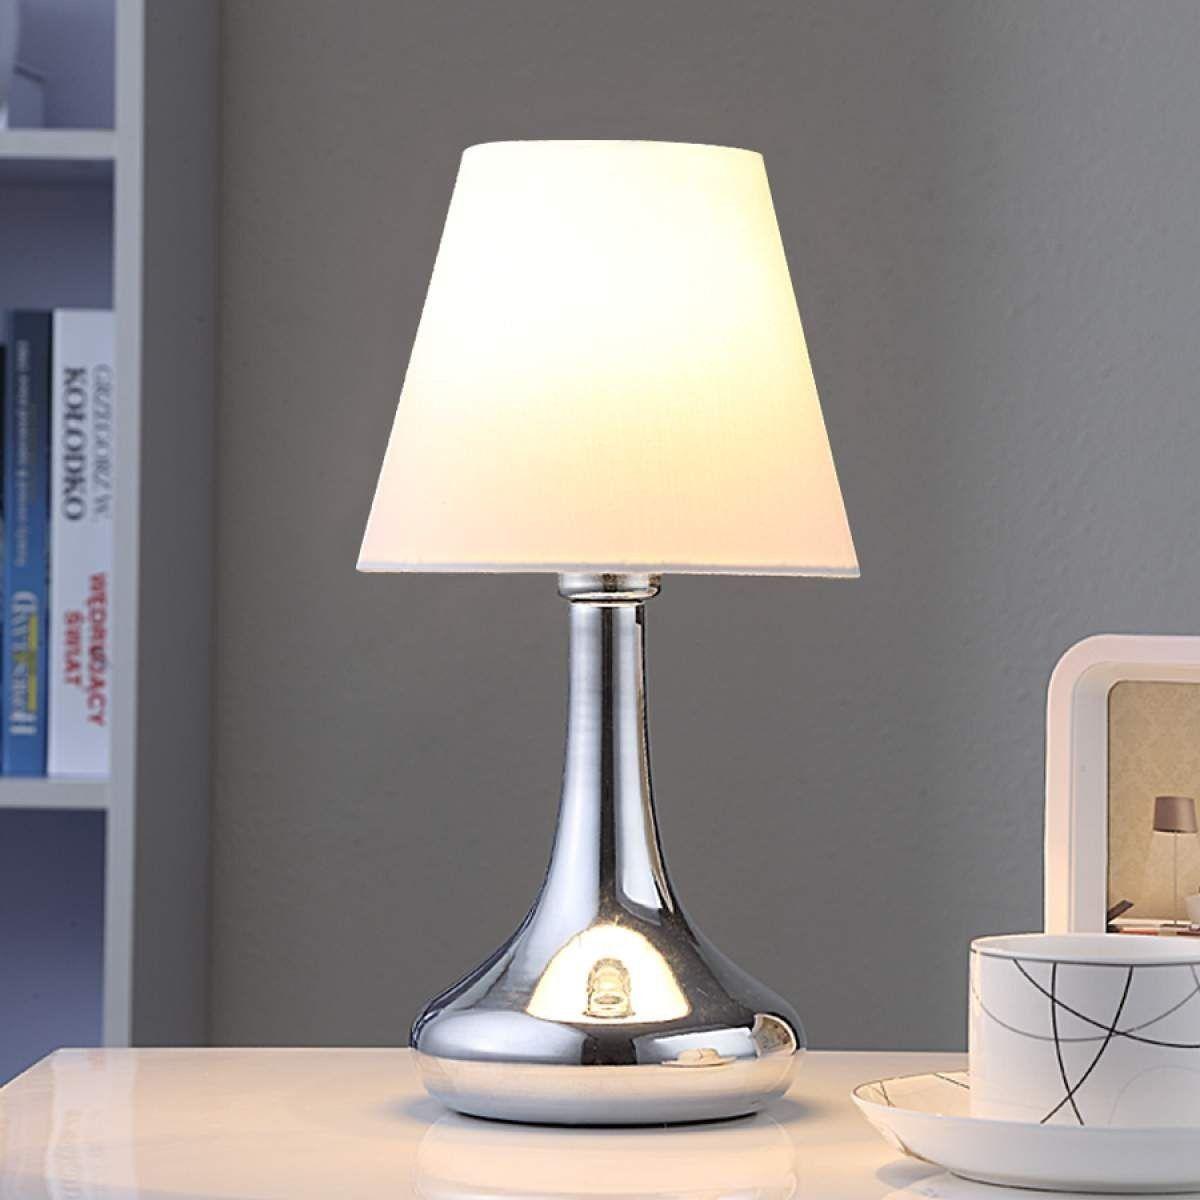 À Lampe Textile En Poser TailleUnique ModerneMarike TJlF1K3c